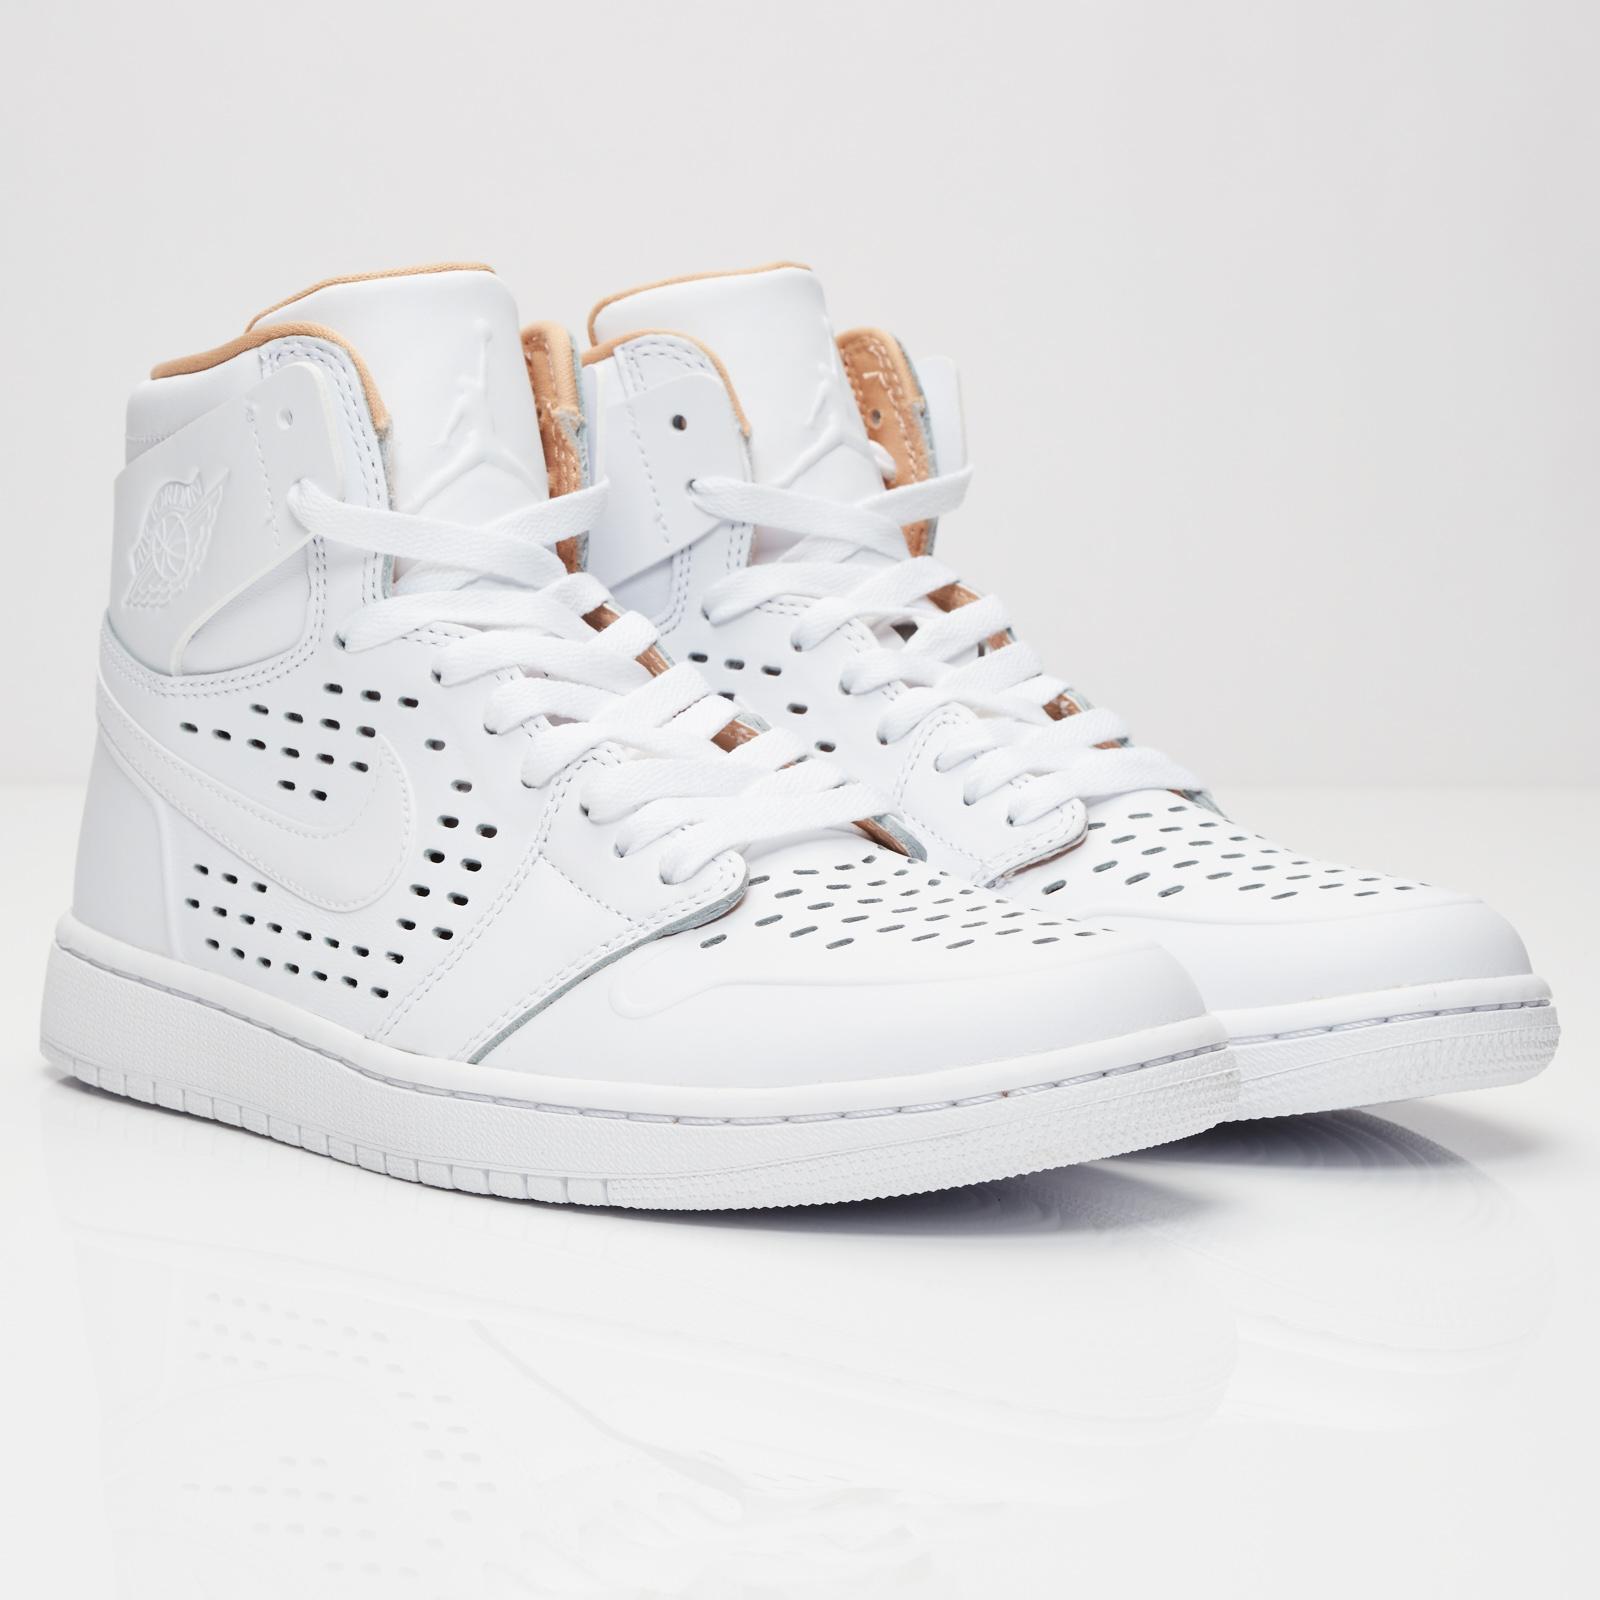 957261e579c Jordan Brand Air Jordan 1 Retro High - 845018-142 - Sneakersnstuff ...